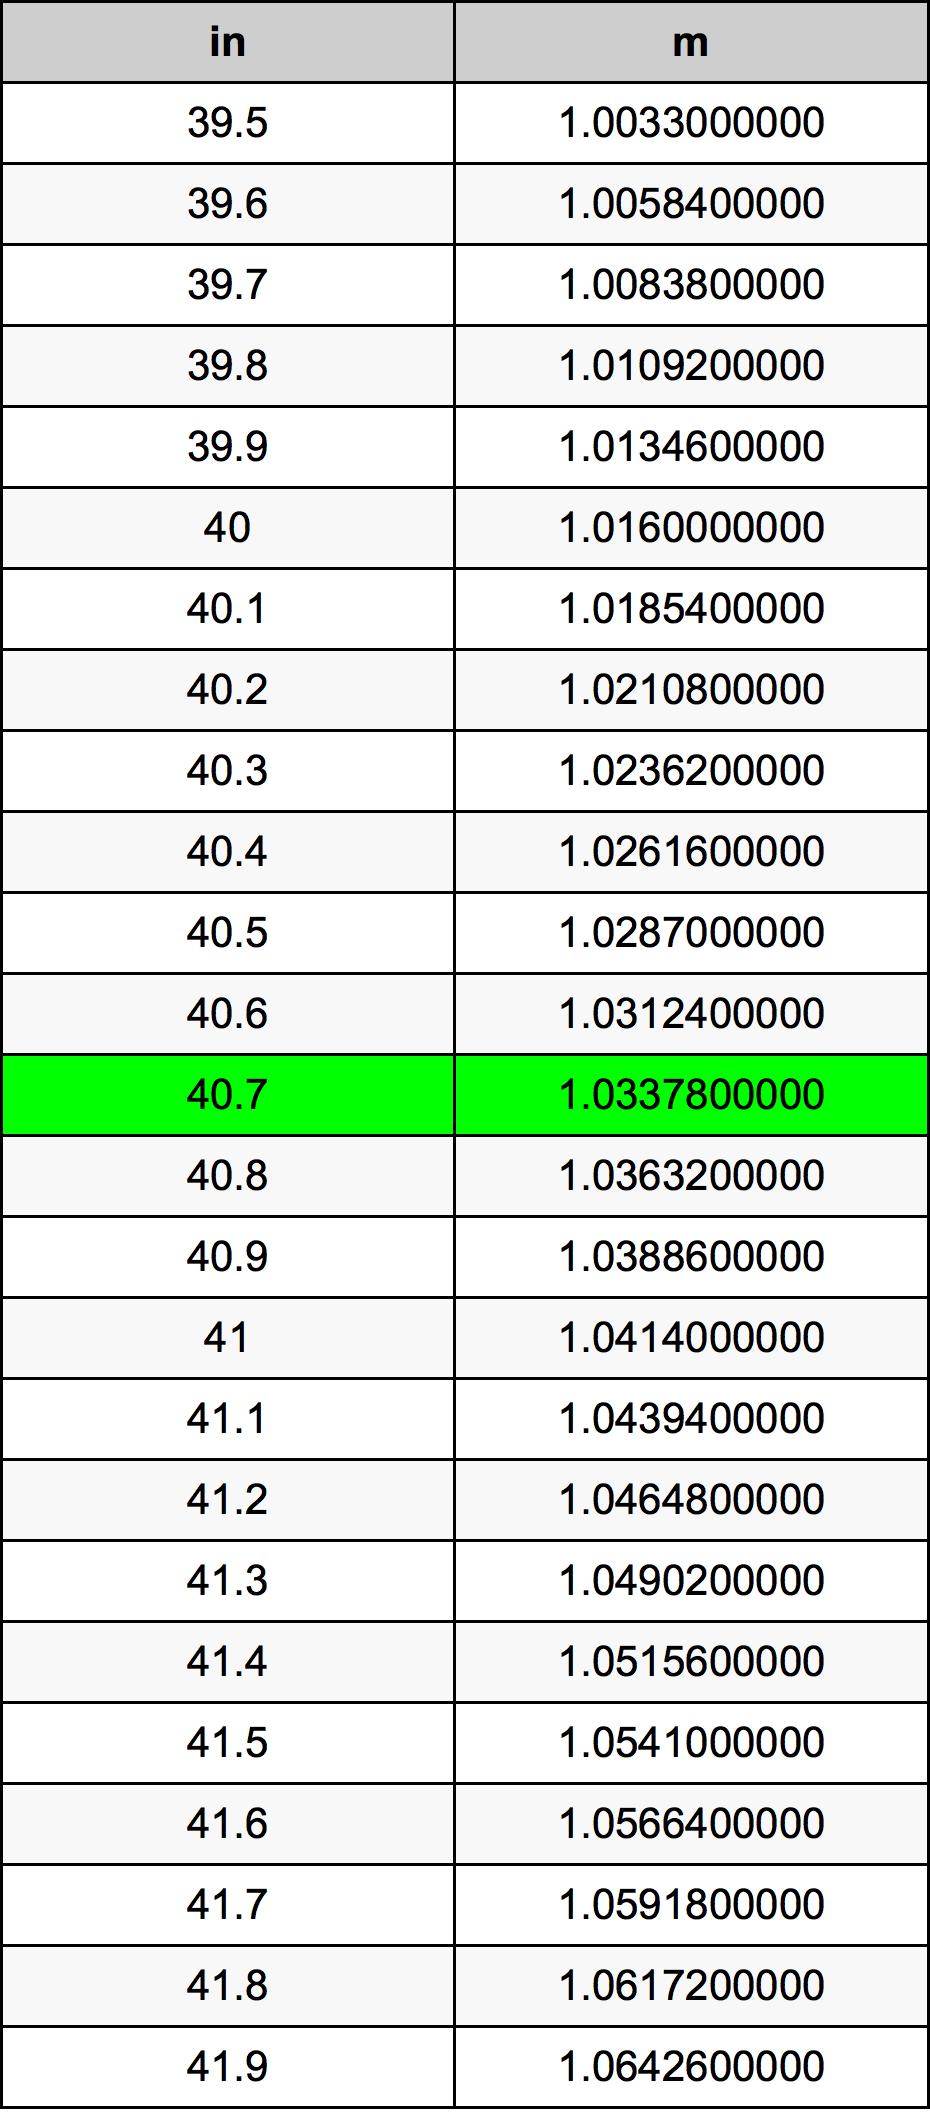 40.7 дюйм Таблица преобразования